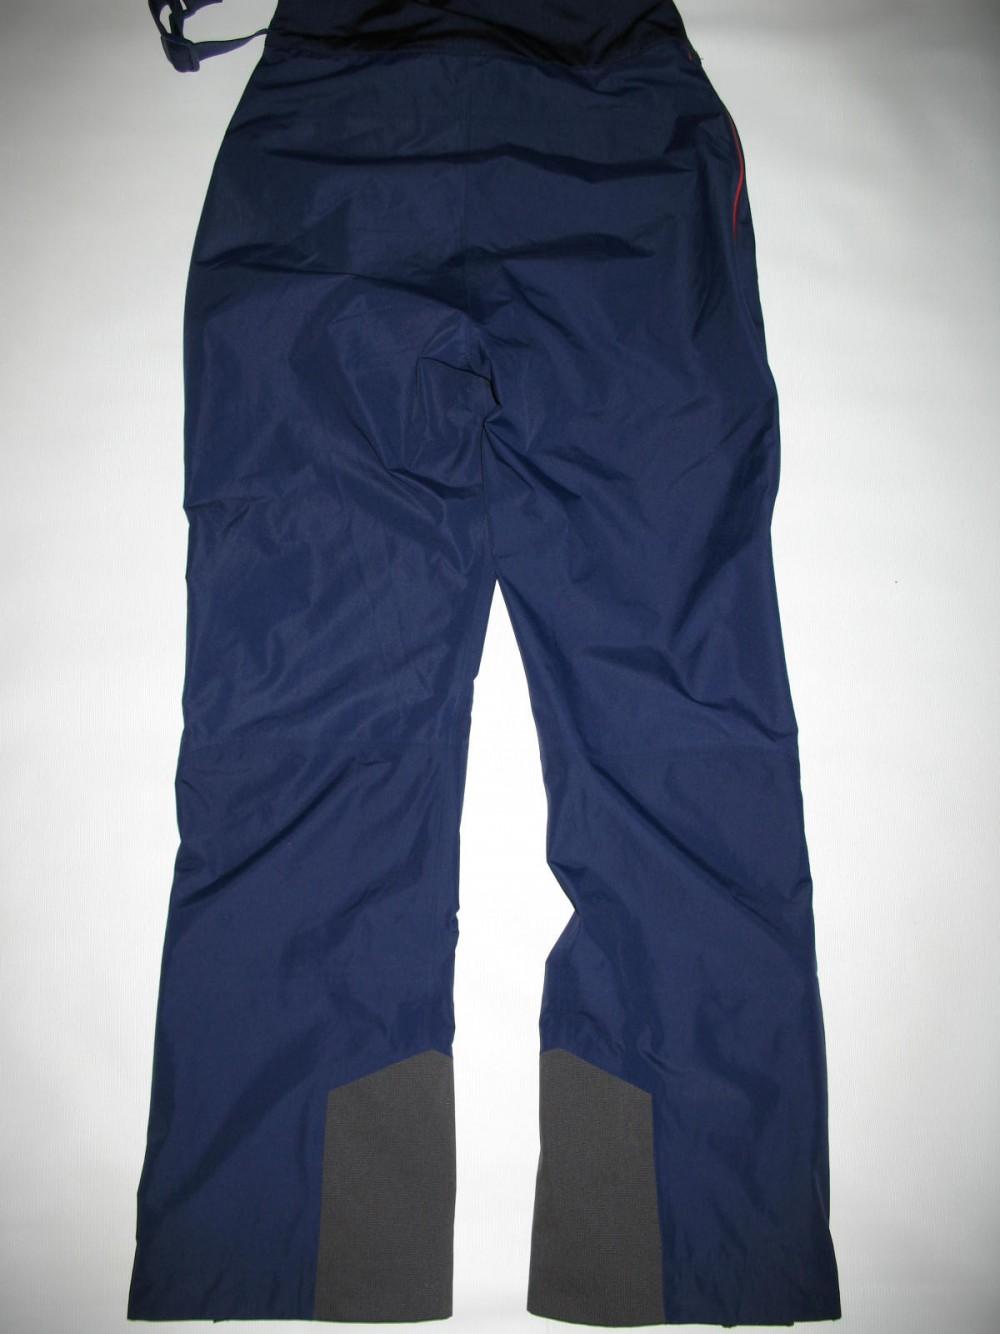 Штаны ACTIVE membrain pants lady (размер 38/M) - 2